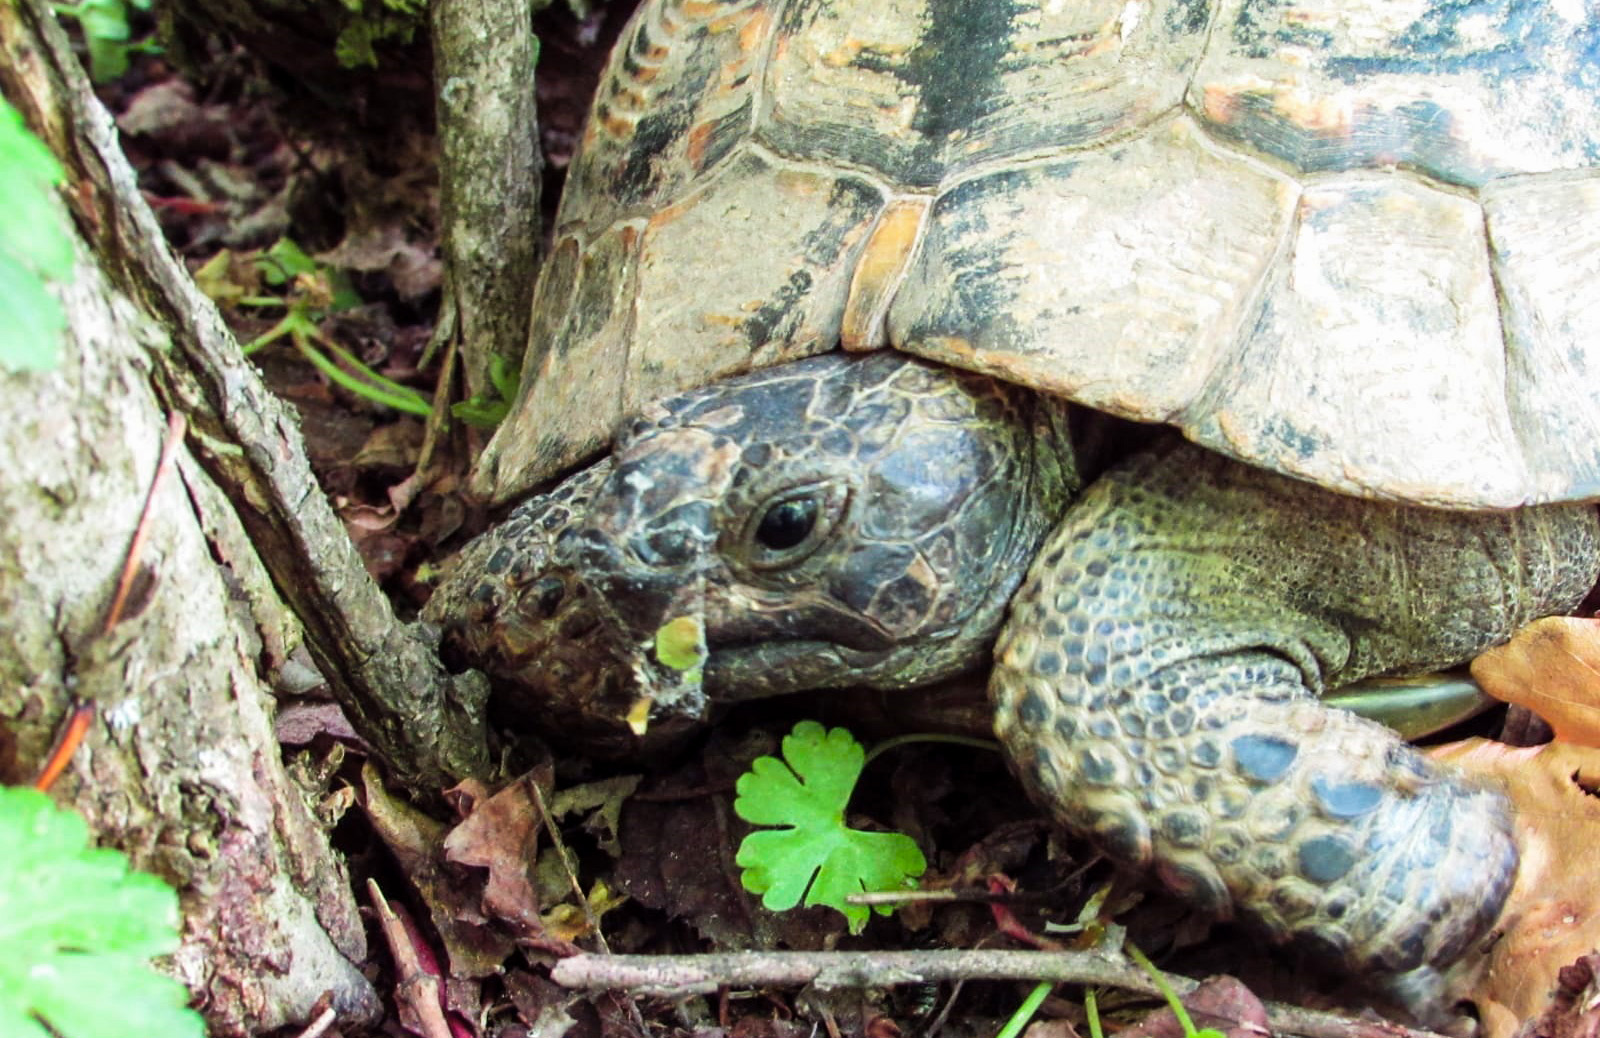 Greek turtle close up